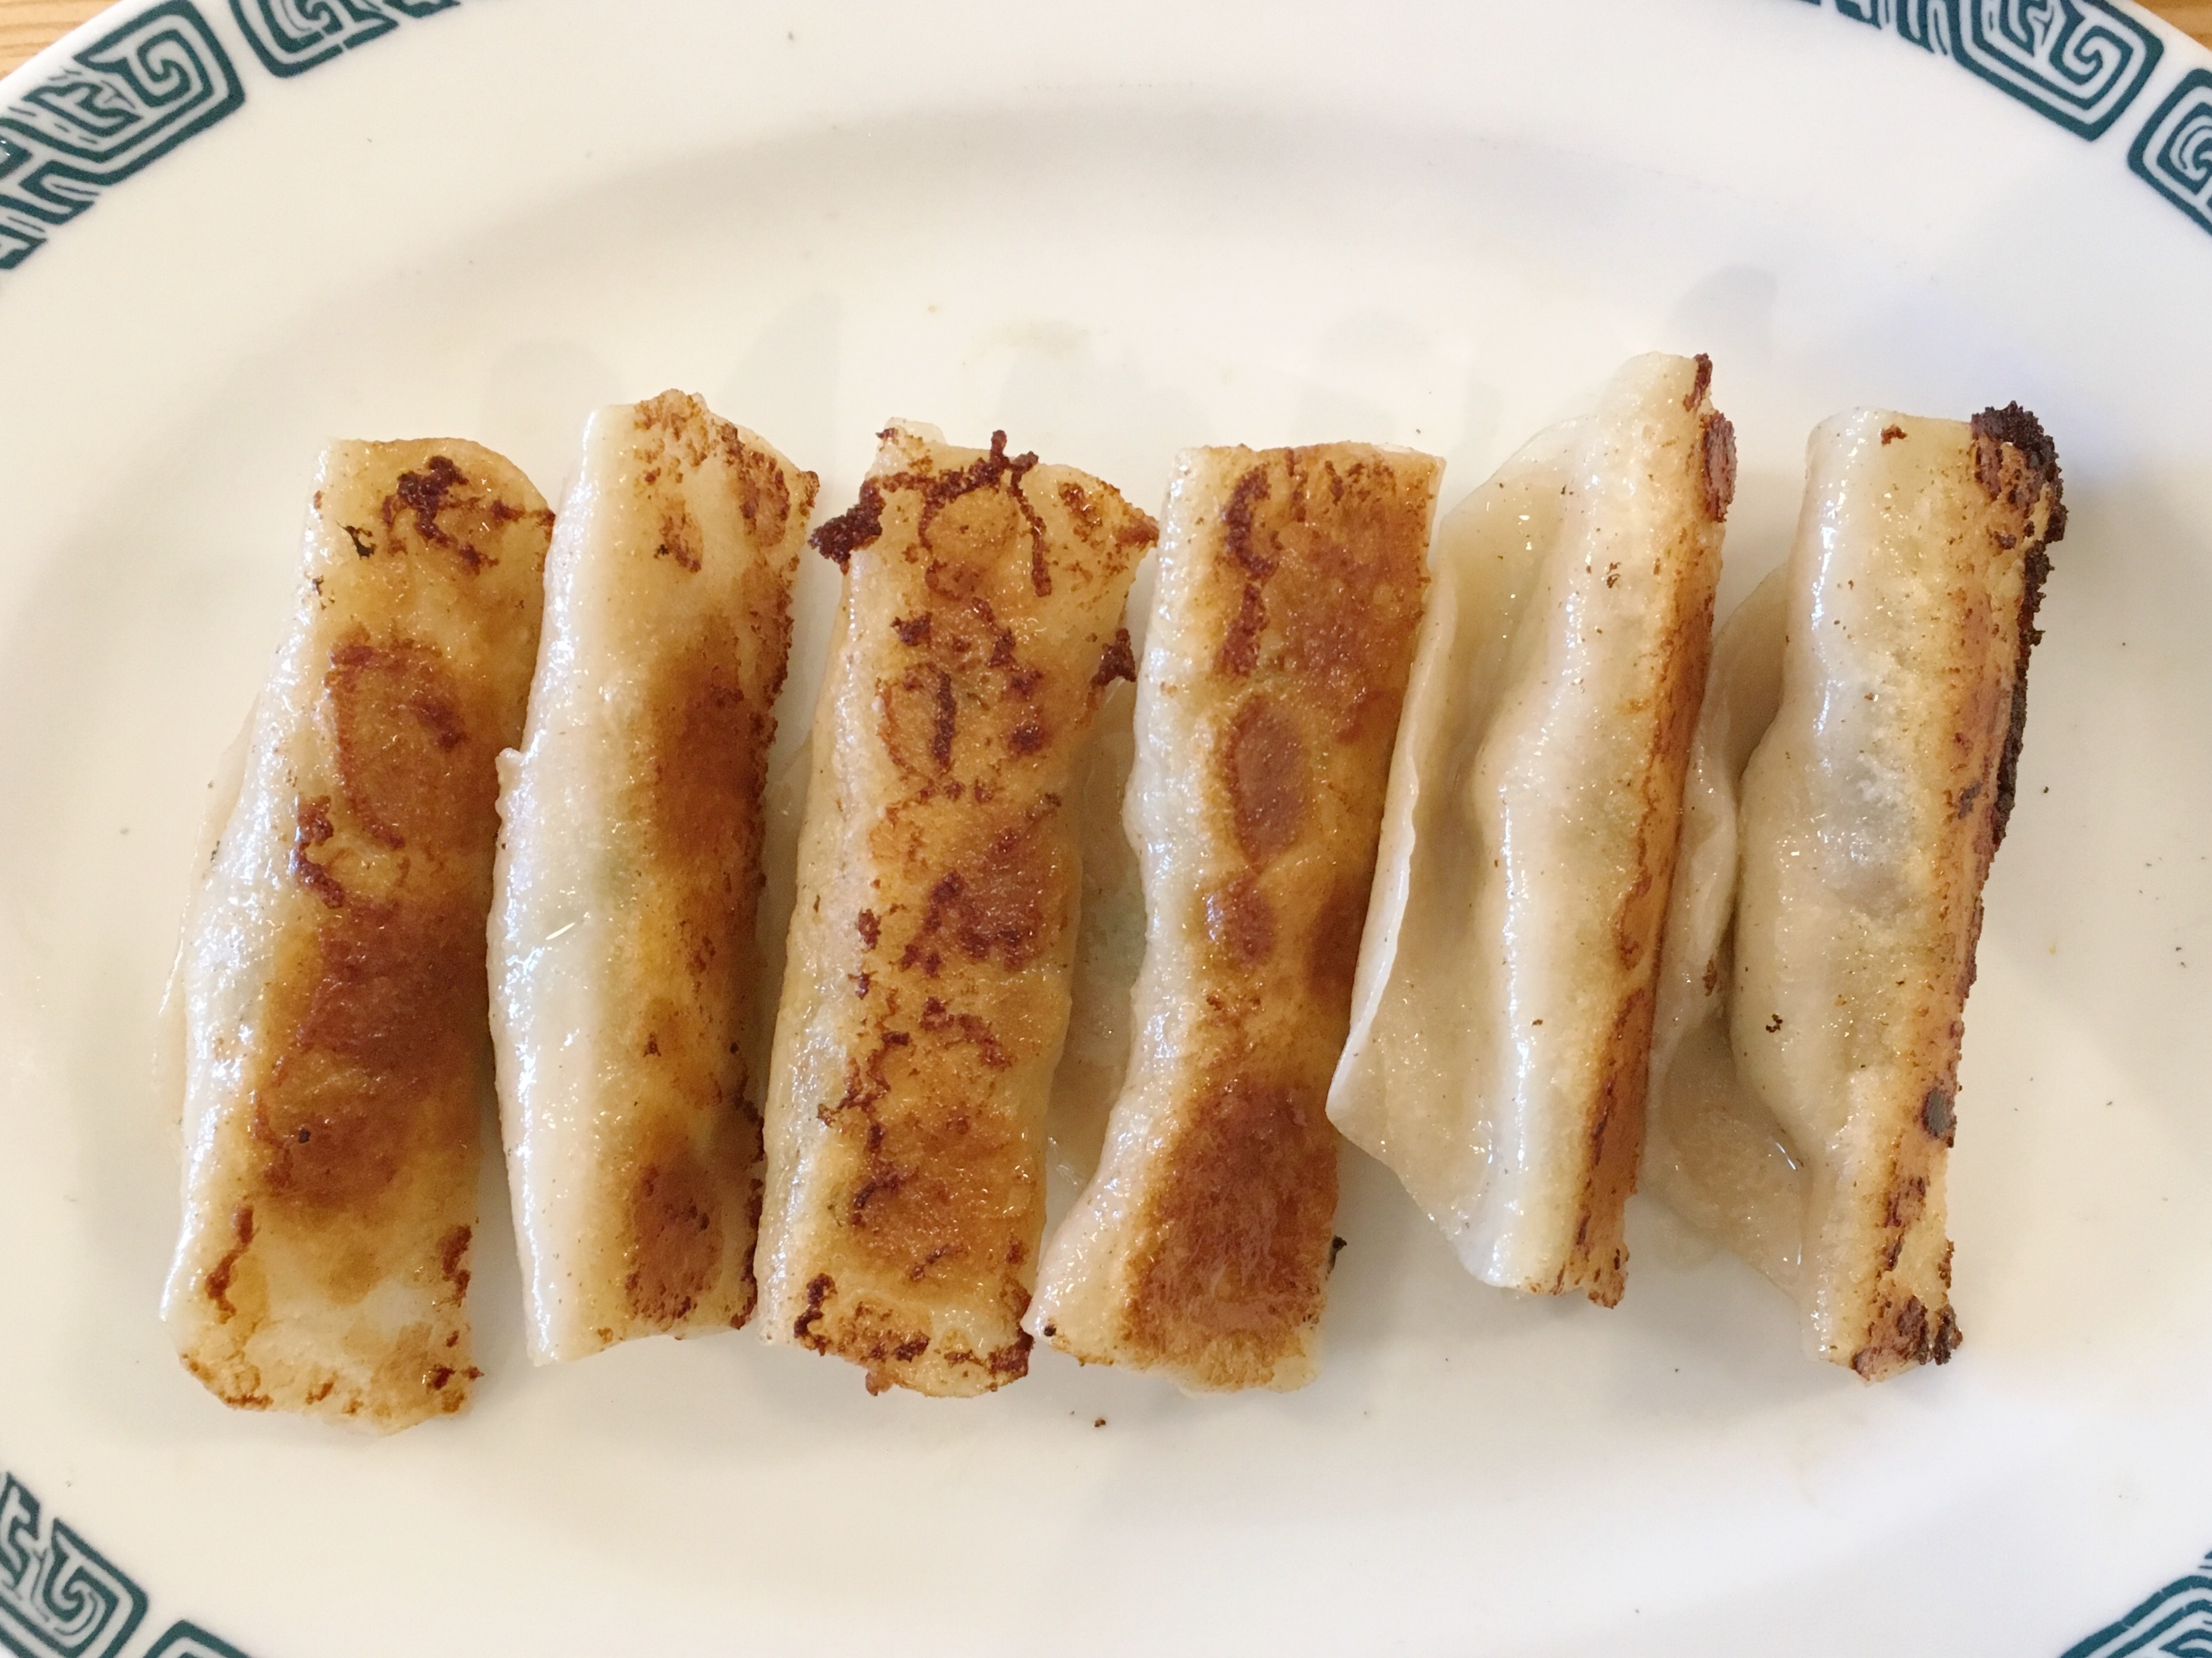 Pan-fried dumplings at Sweet Chive